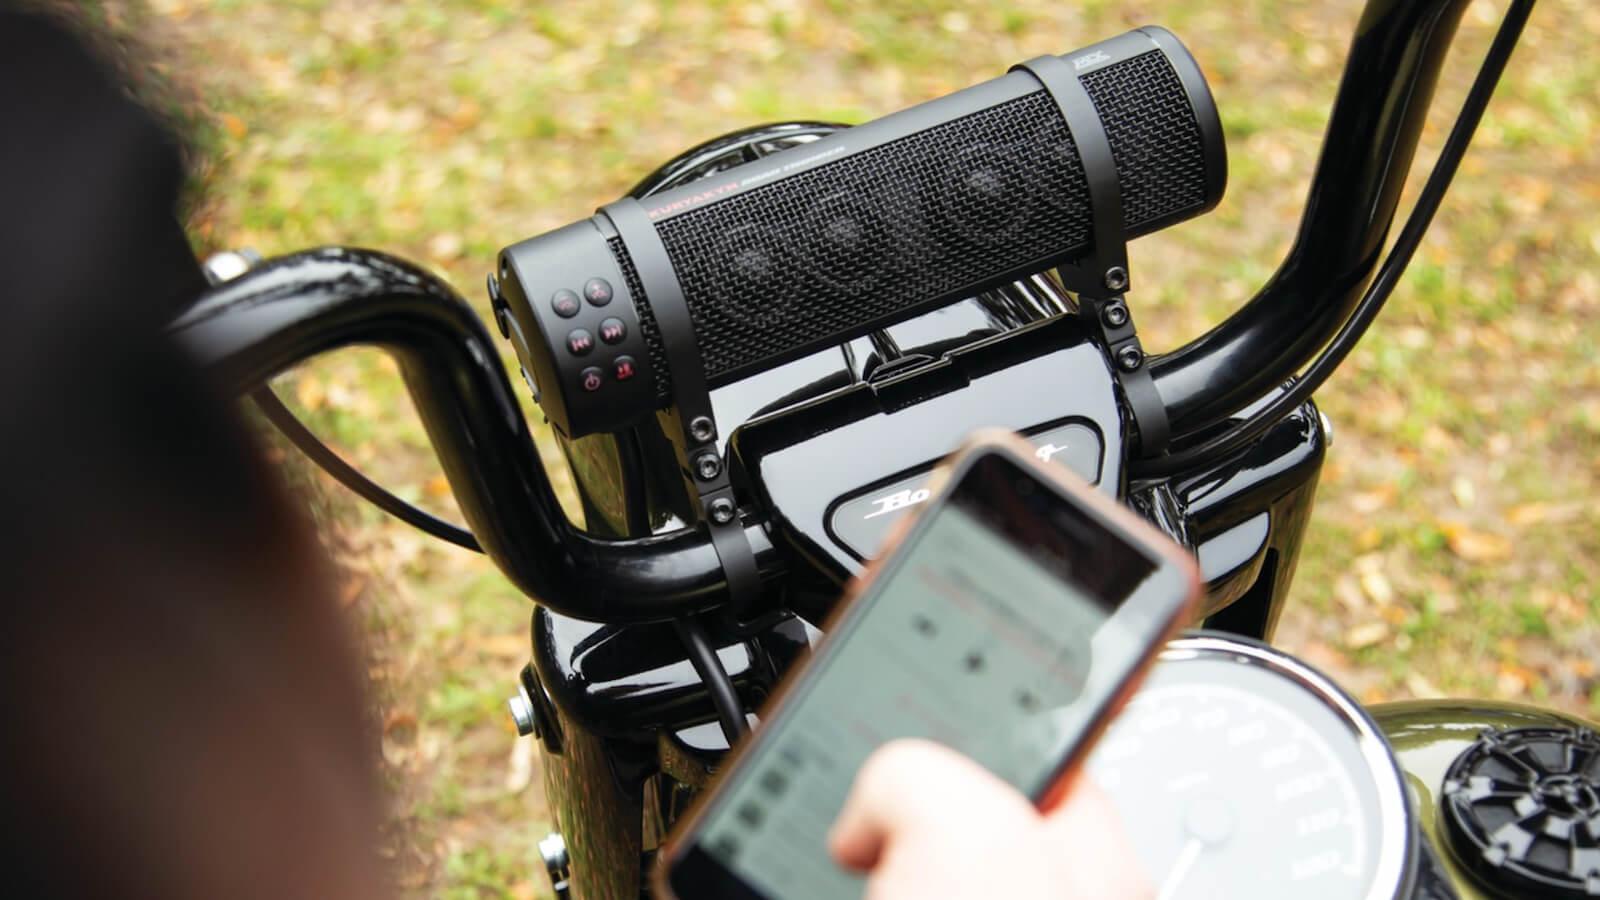 Kuryakyn Road Thunder Sound Bar Plus is a distortion-free handlebar-mounted speaker